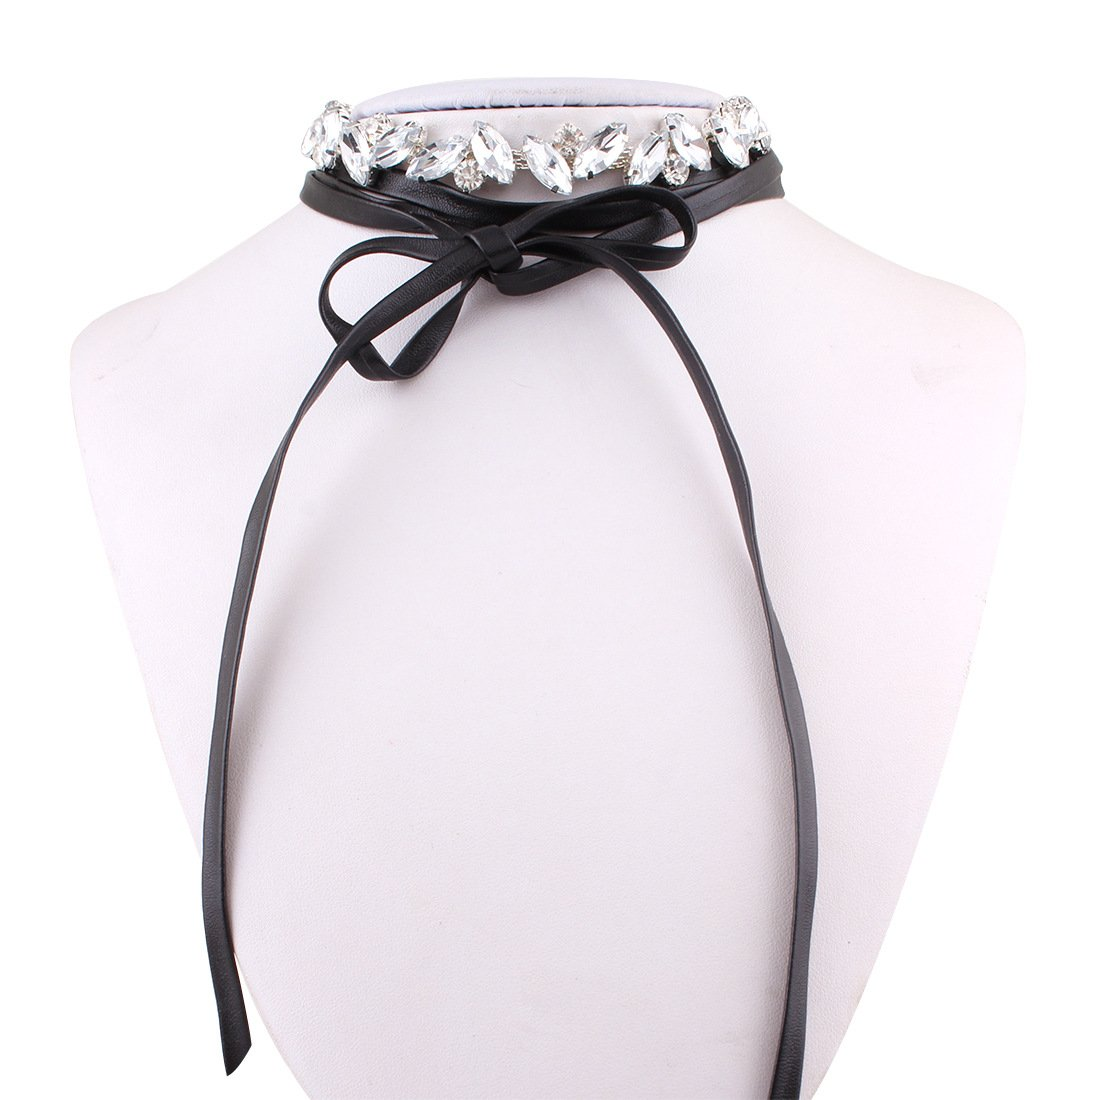 Punk Style Leather Choker Necklace for Women Girls Choker Velvet Necklace Adjustable